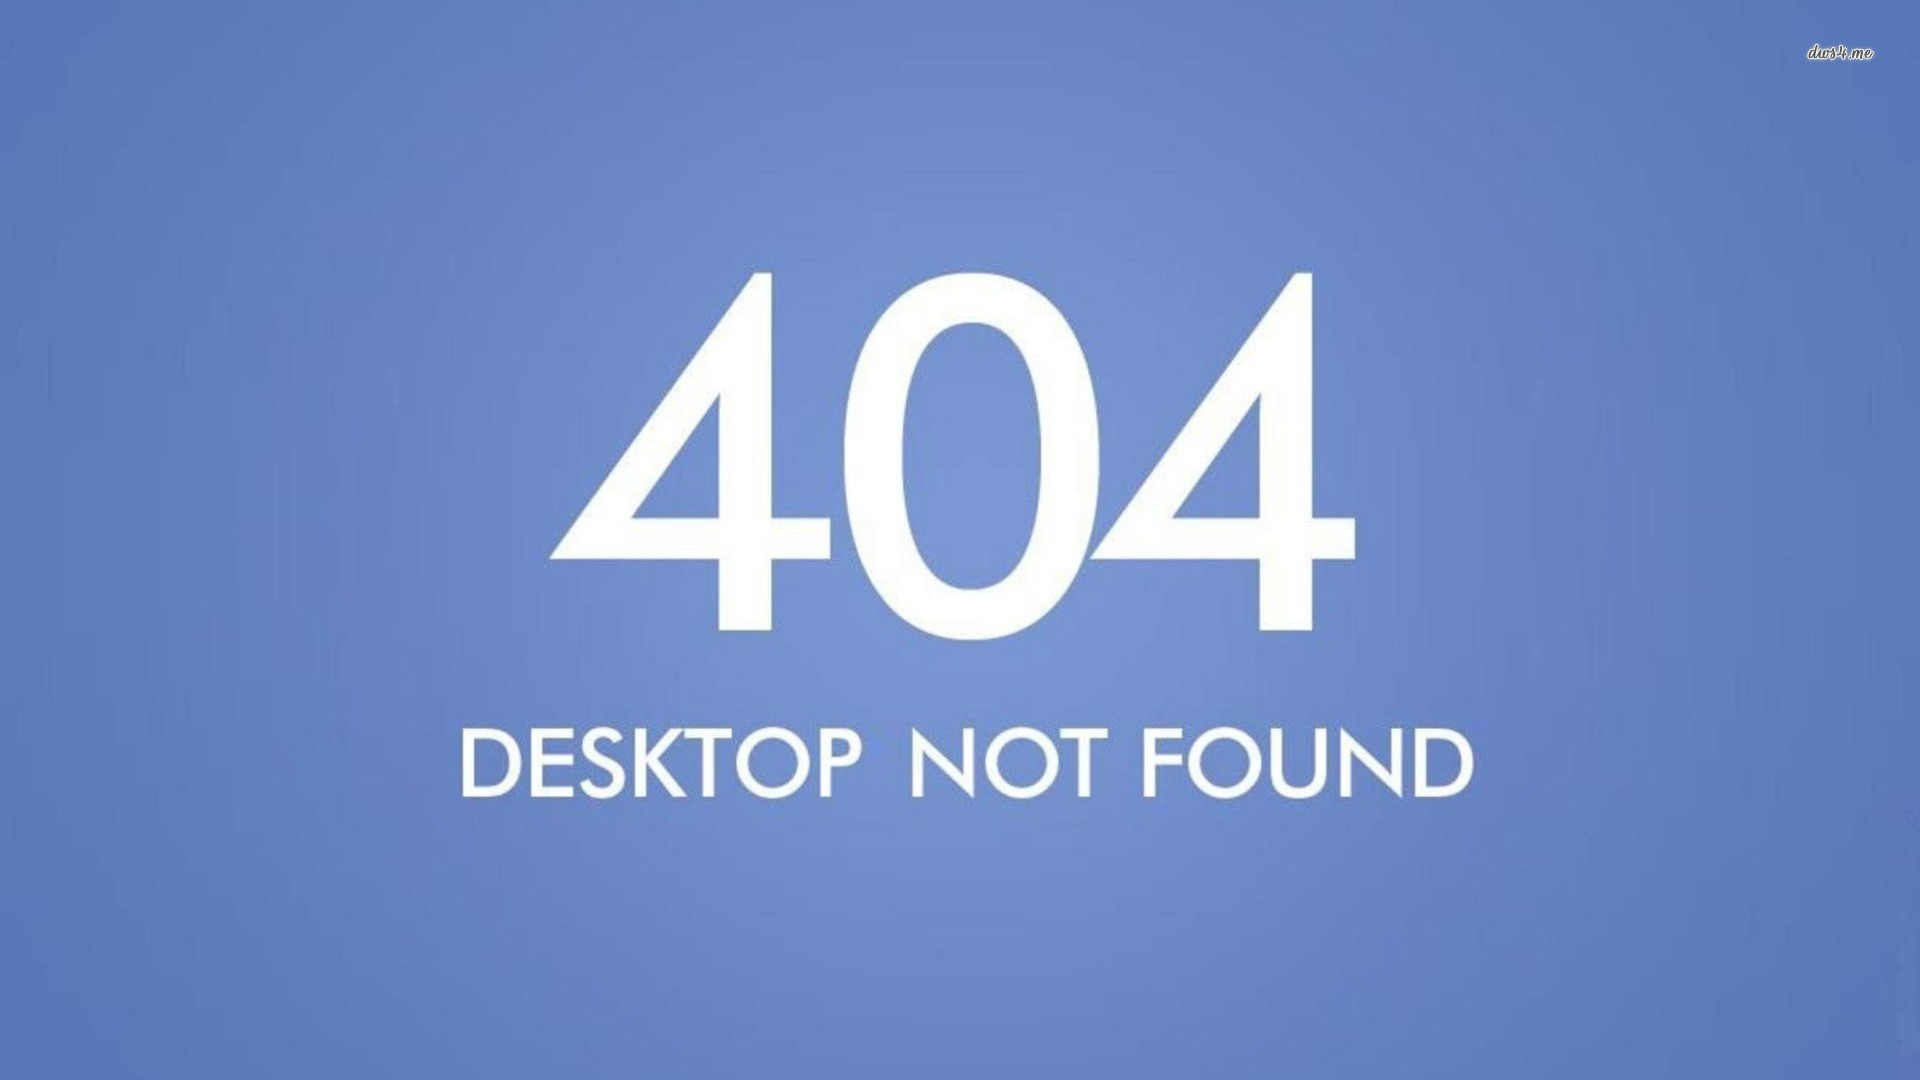 Name: 9845-desktop-not-found-1920×1080-digital-art-